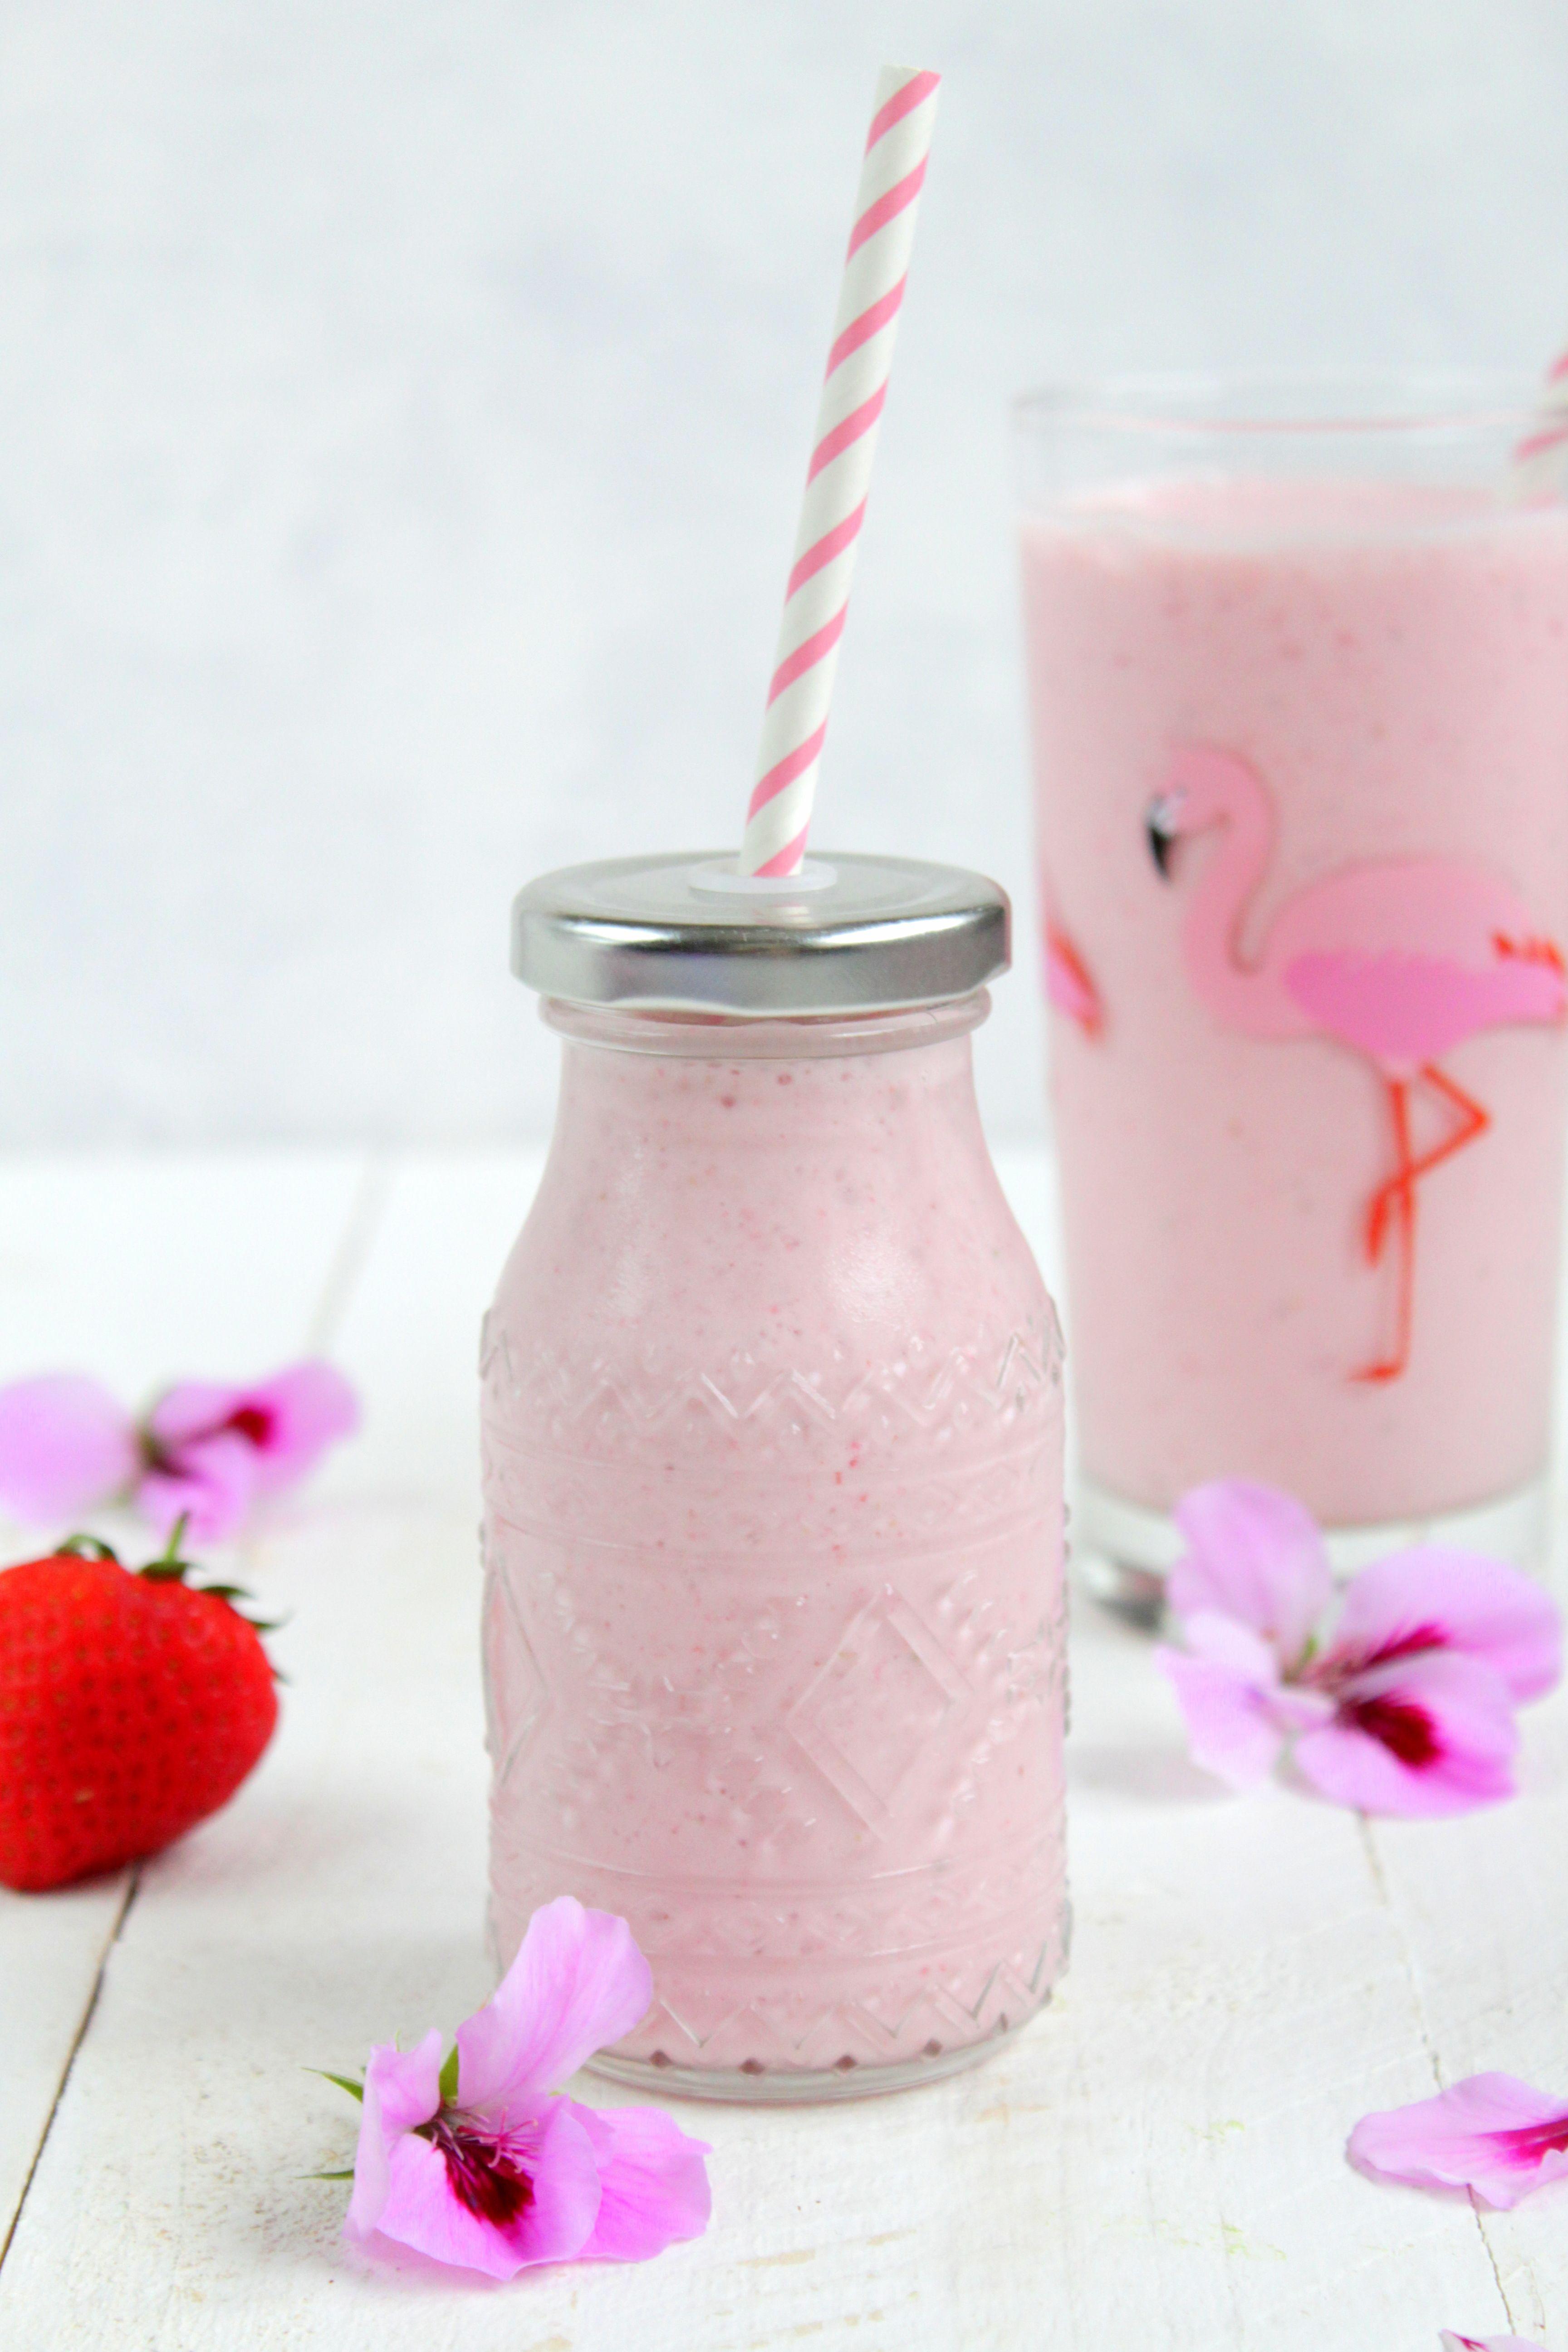 Erdbeer Lassi | TM Getränke | Pinterest | Lassi, Thermomix and Food